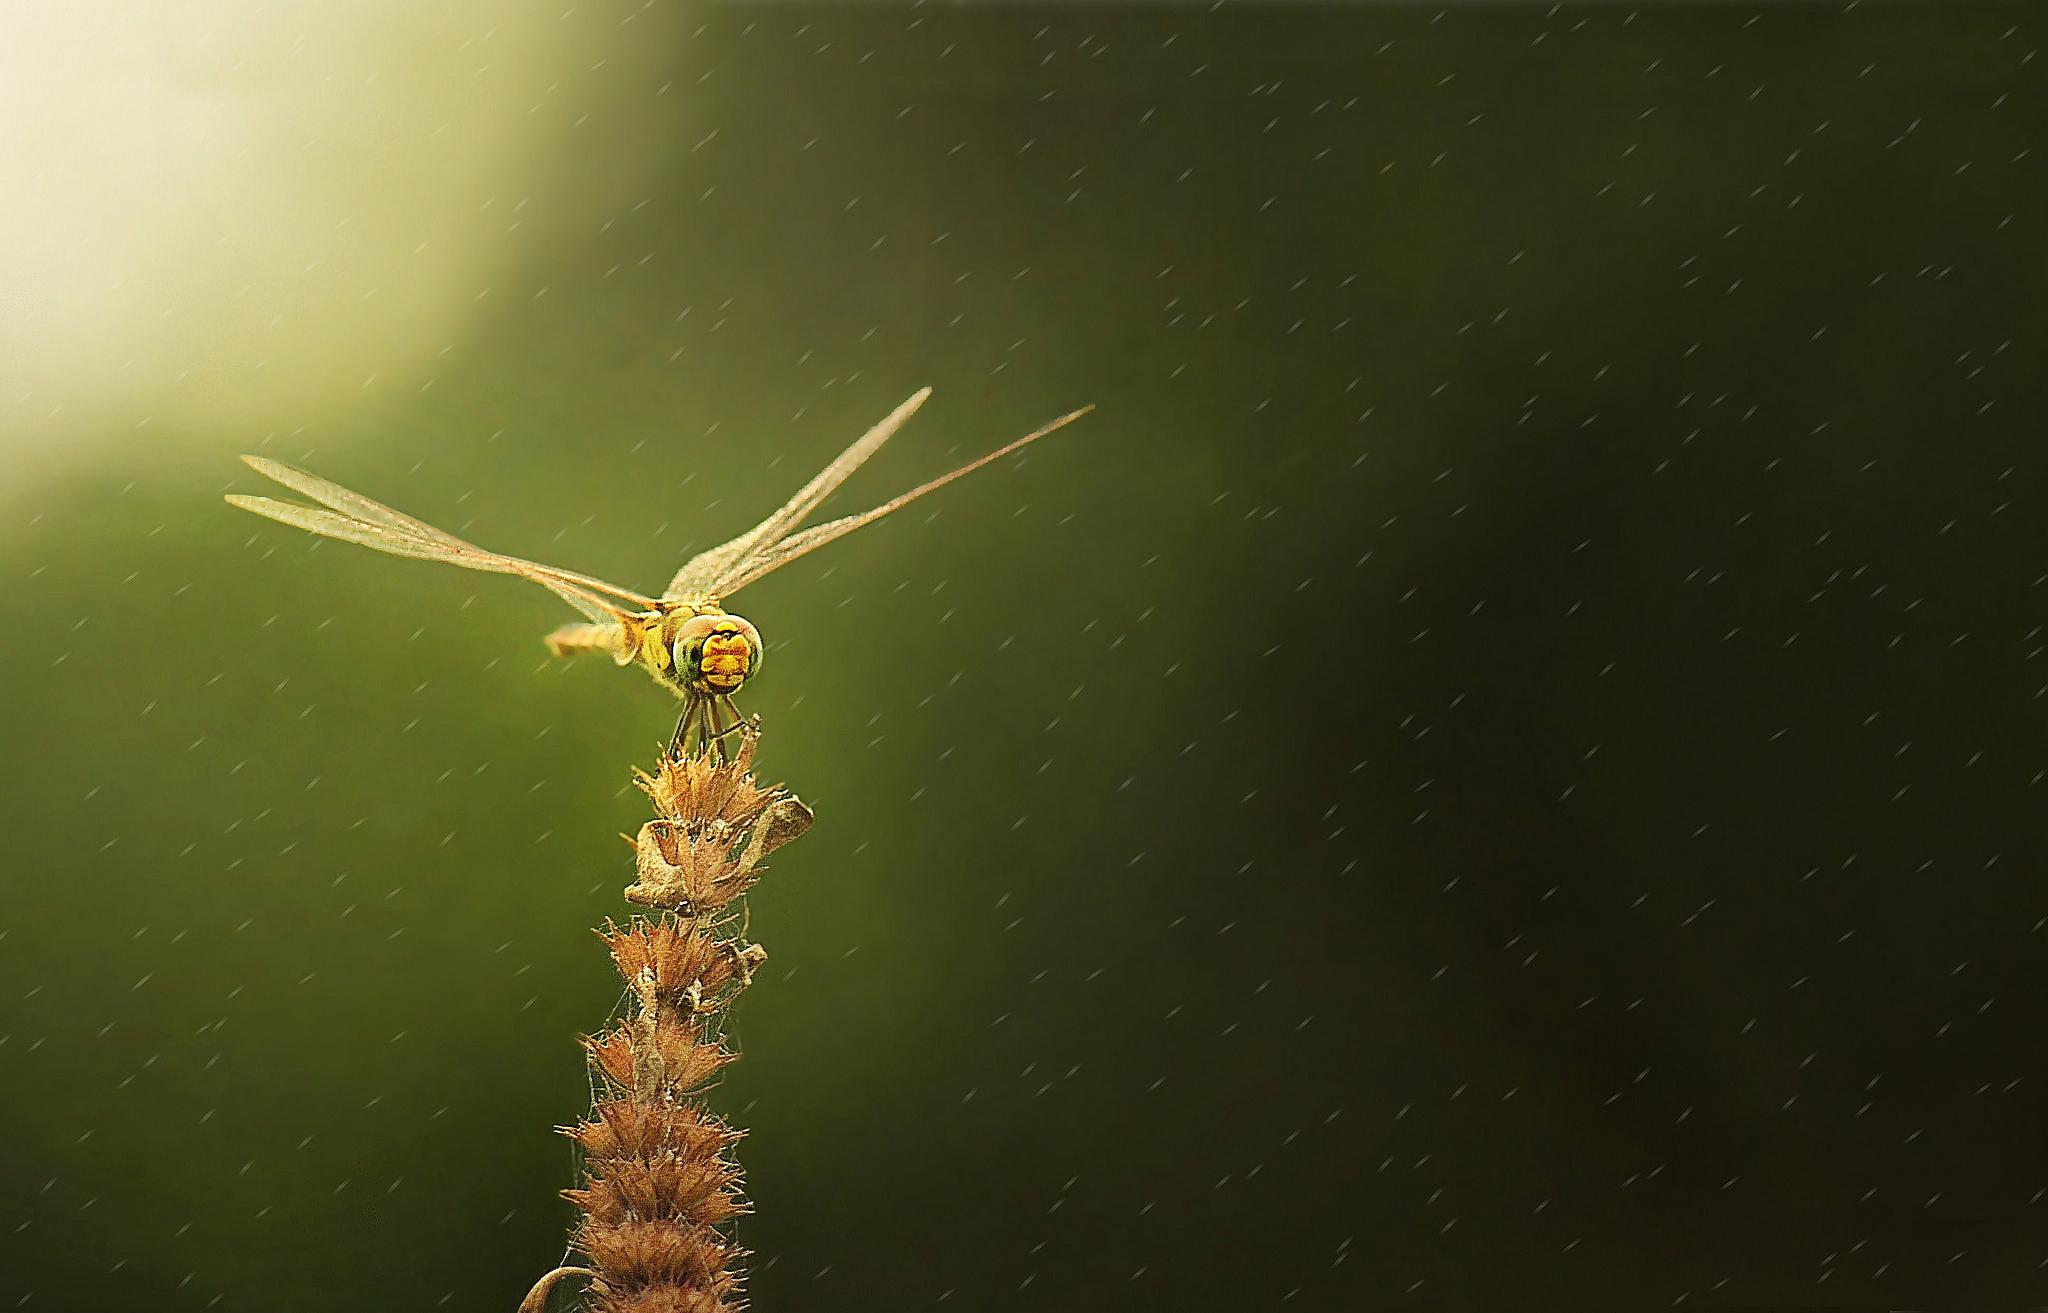 Beauty of nature  by oliurpritom